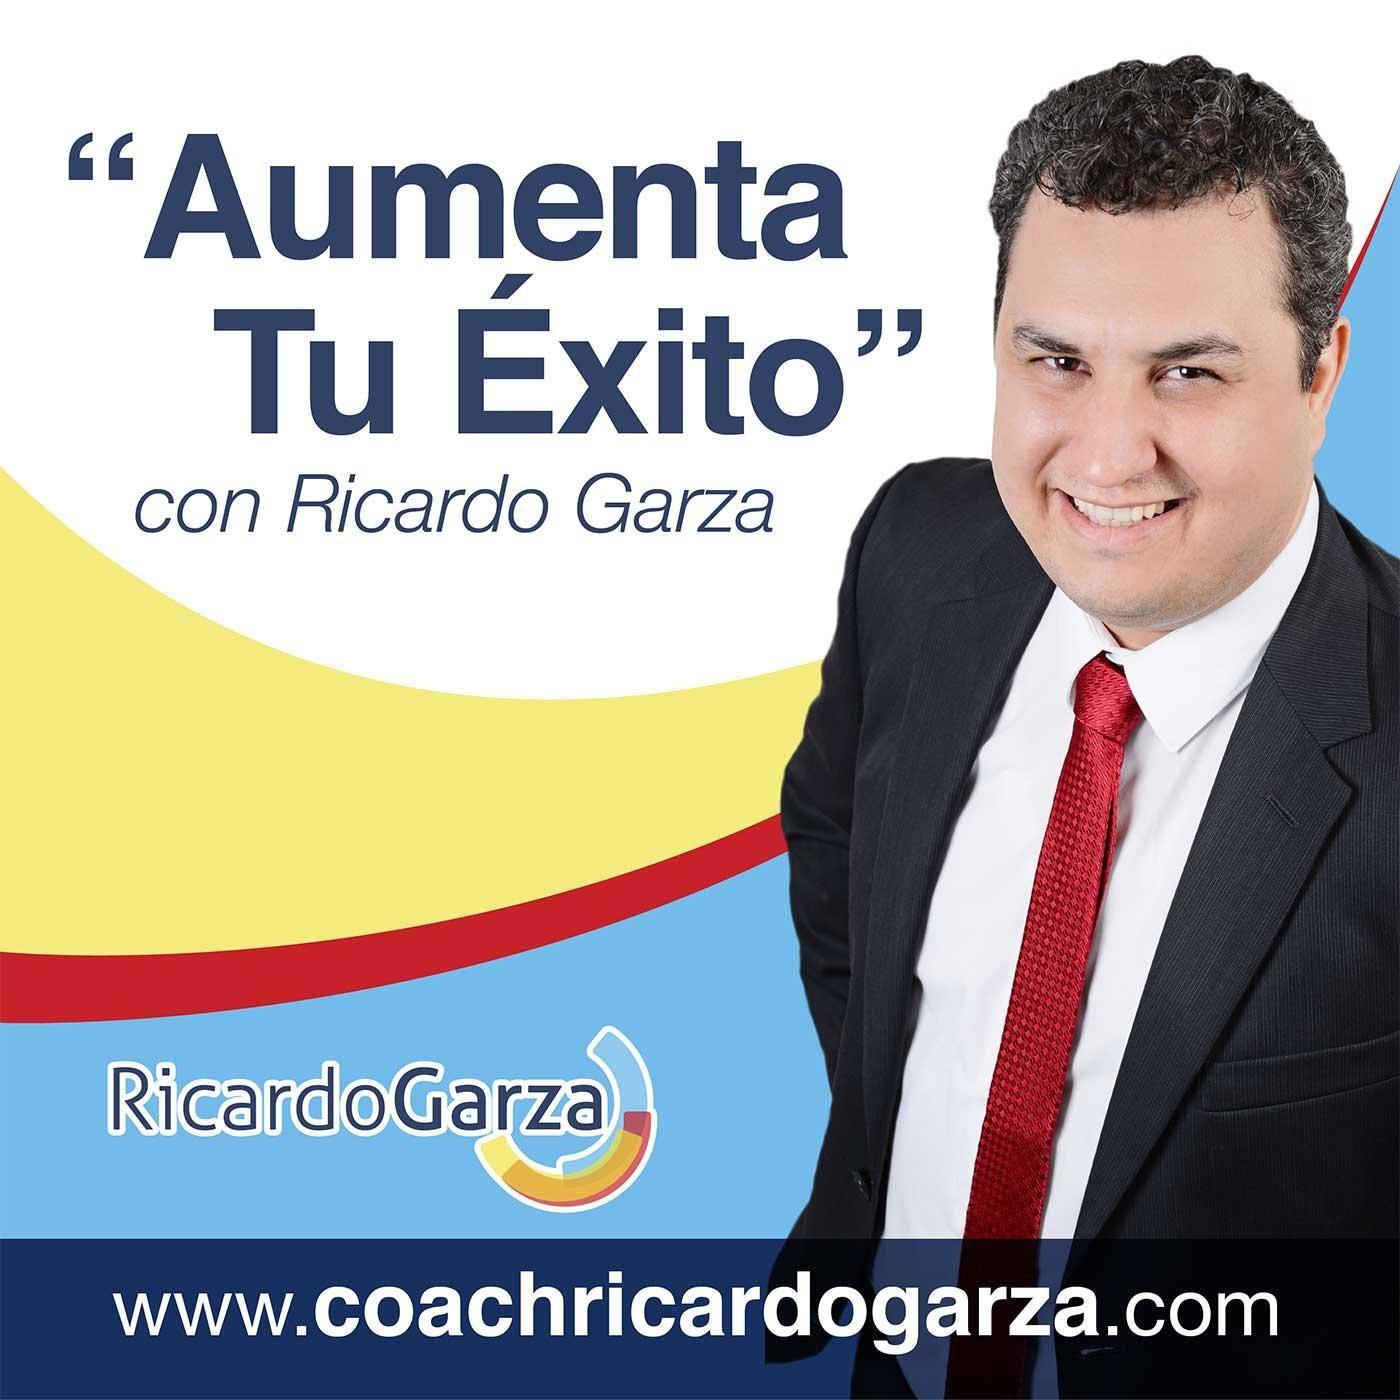 <![CDATA[Aumenta Tu Exito con Ricardo Garza]]>